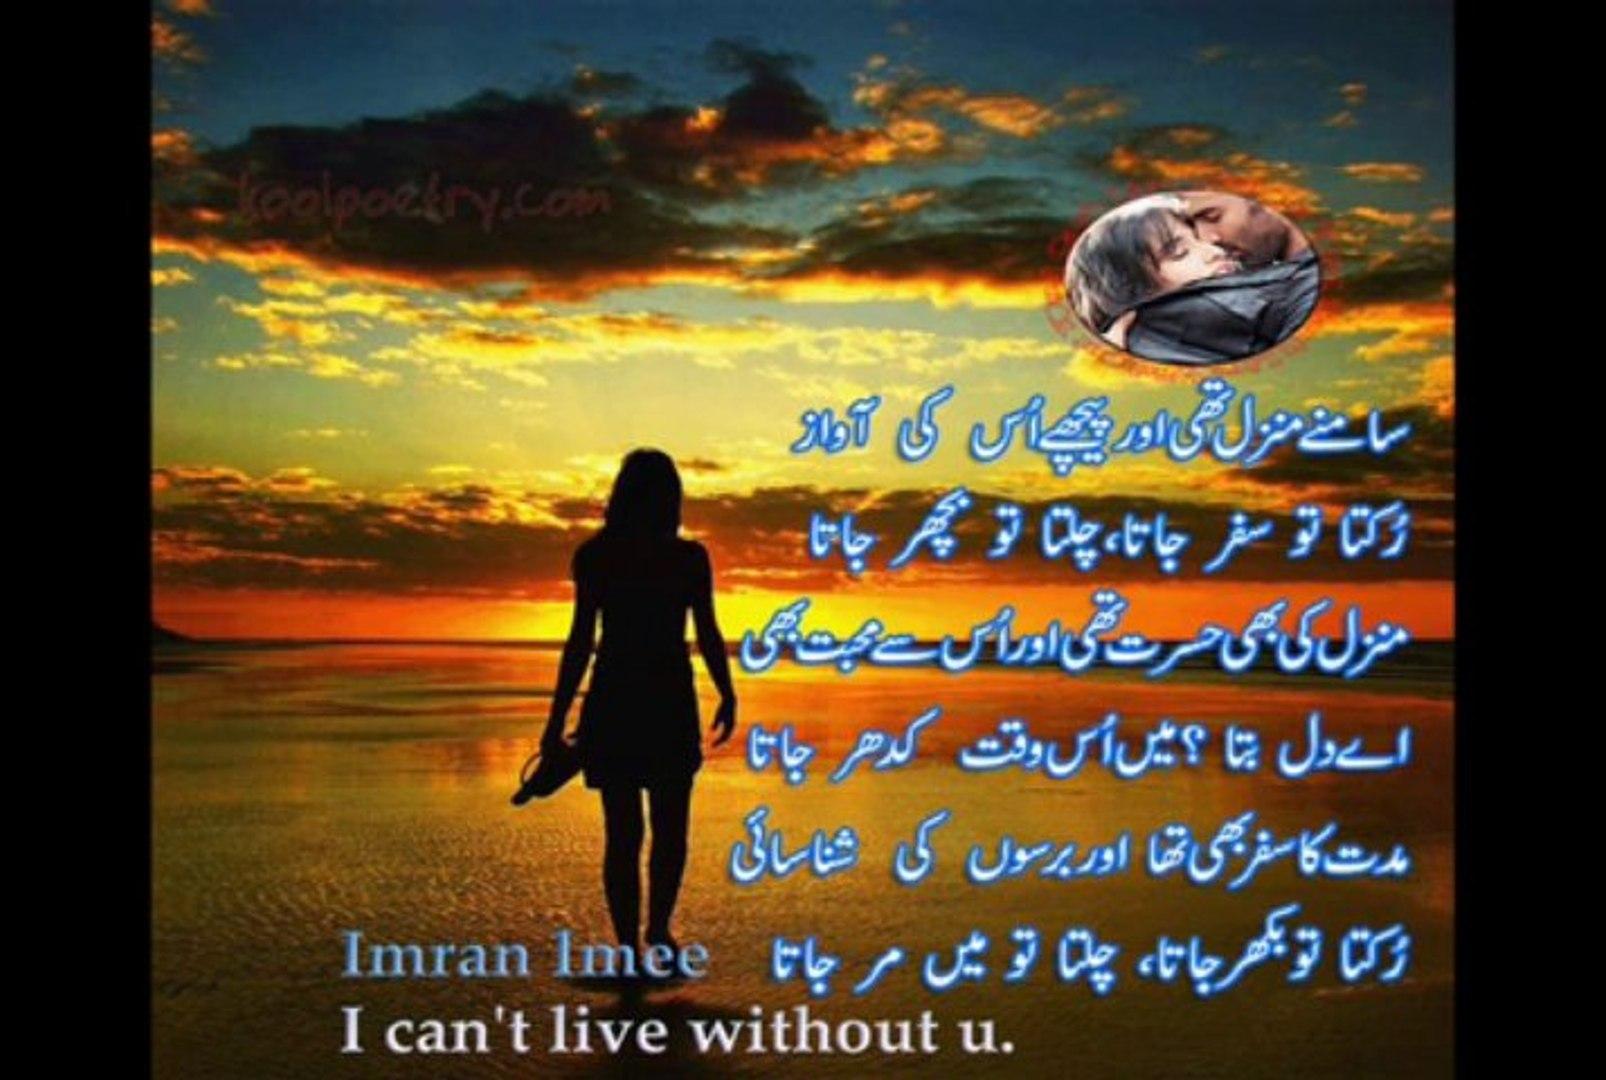 zamanay beet jate hai BY Imran imee